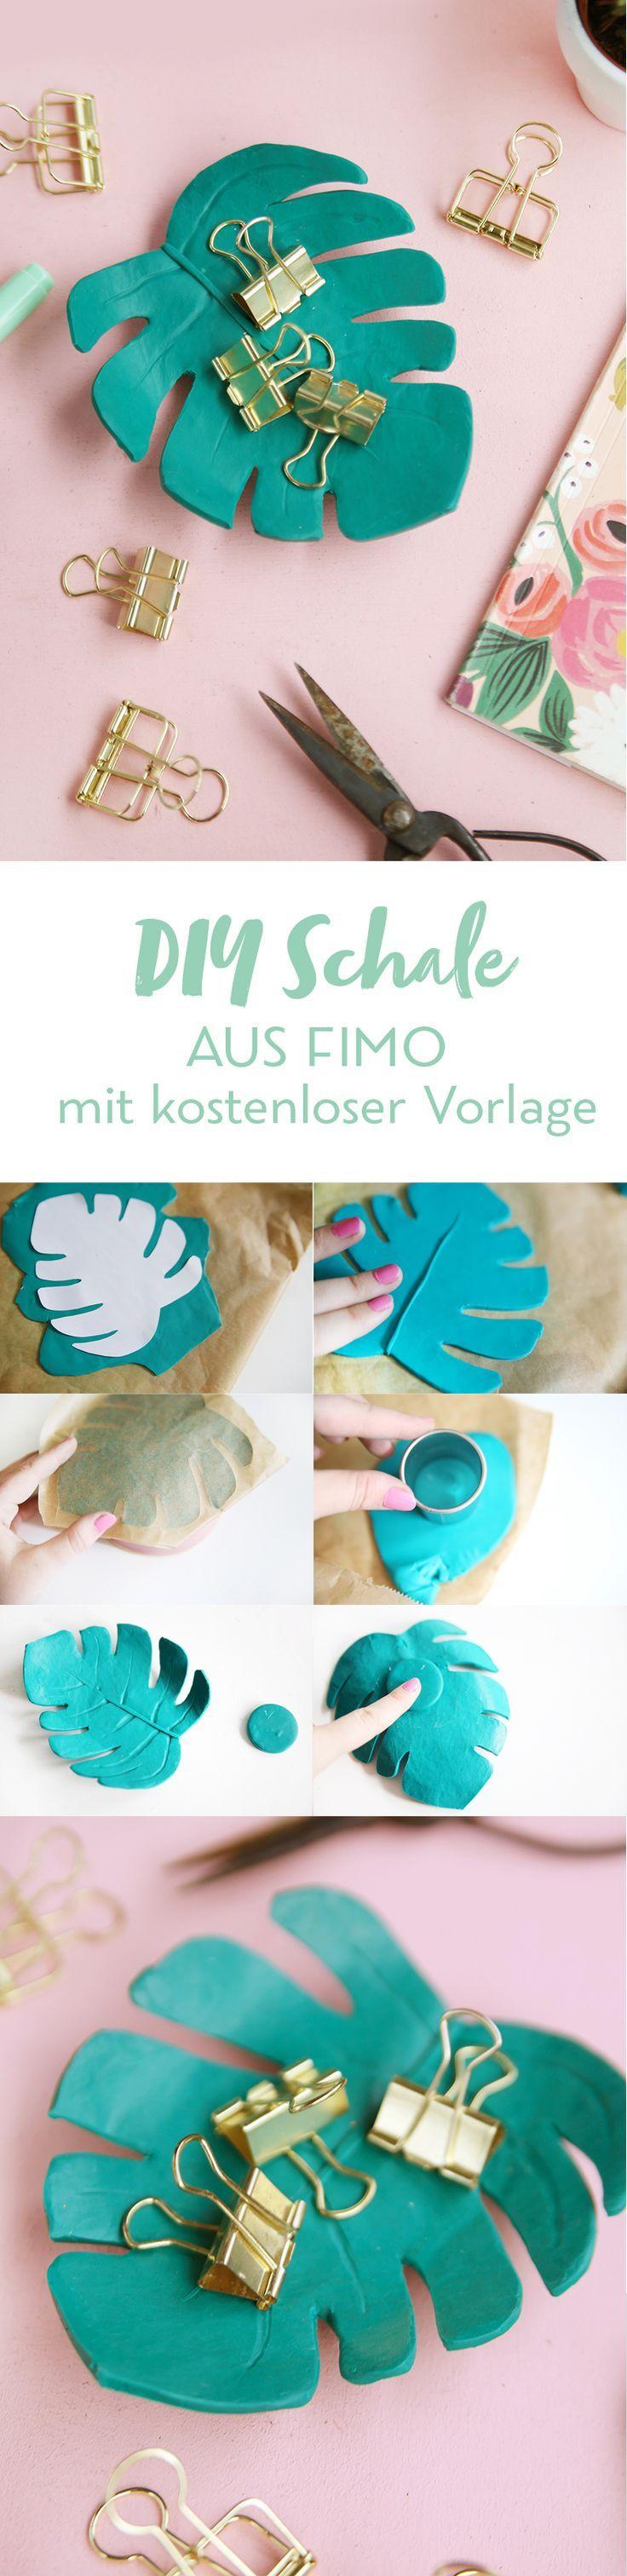 DIY: Monstera-Schale aus Fimo selbermachen – Filizity. – Rezepte & DIY Ideen: Basteln, Geschenkideen, Deko, Beauty, Fashion & Wohnen